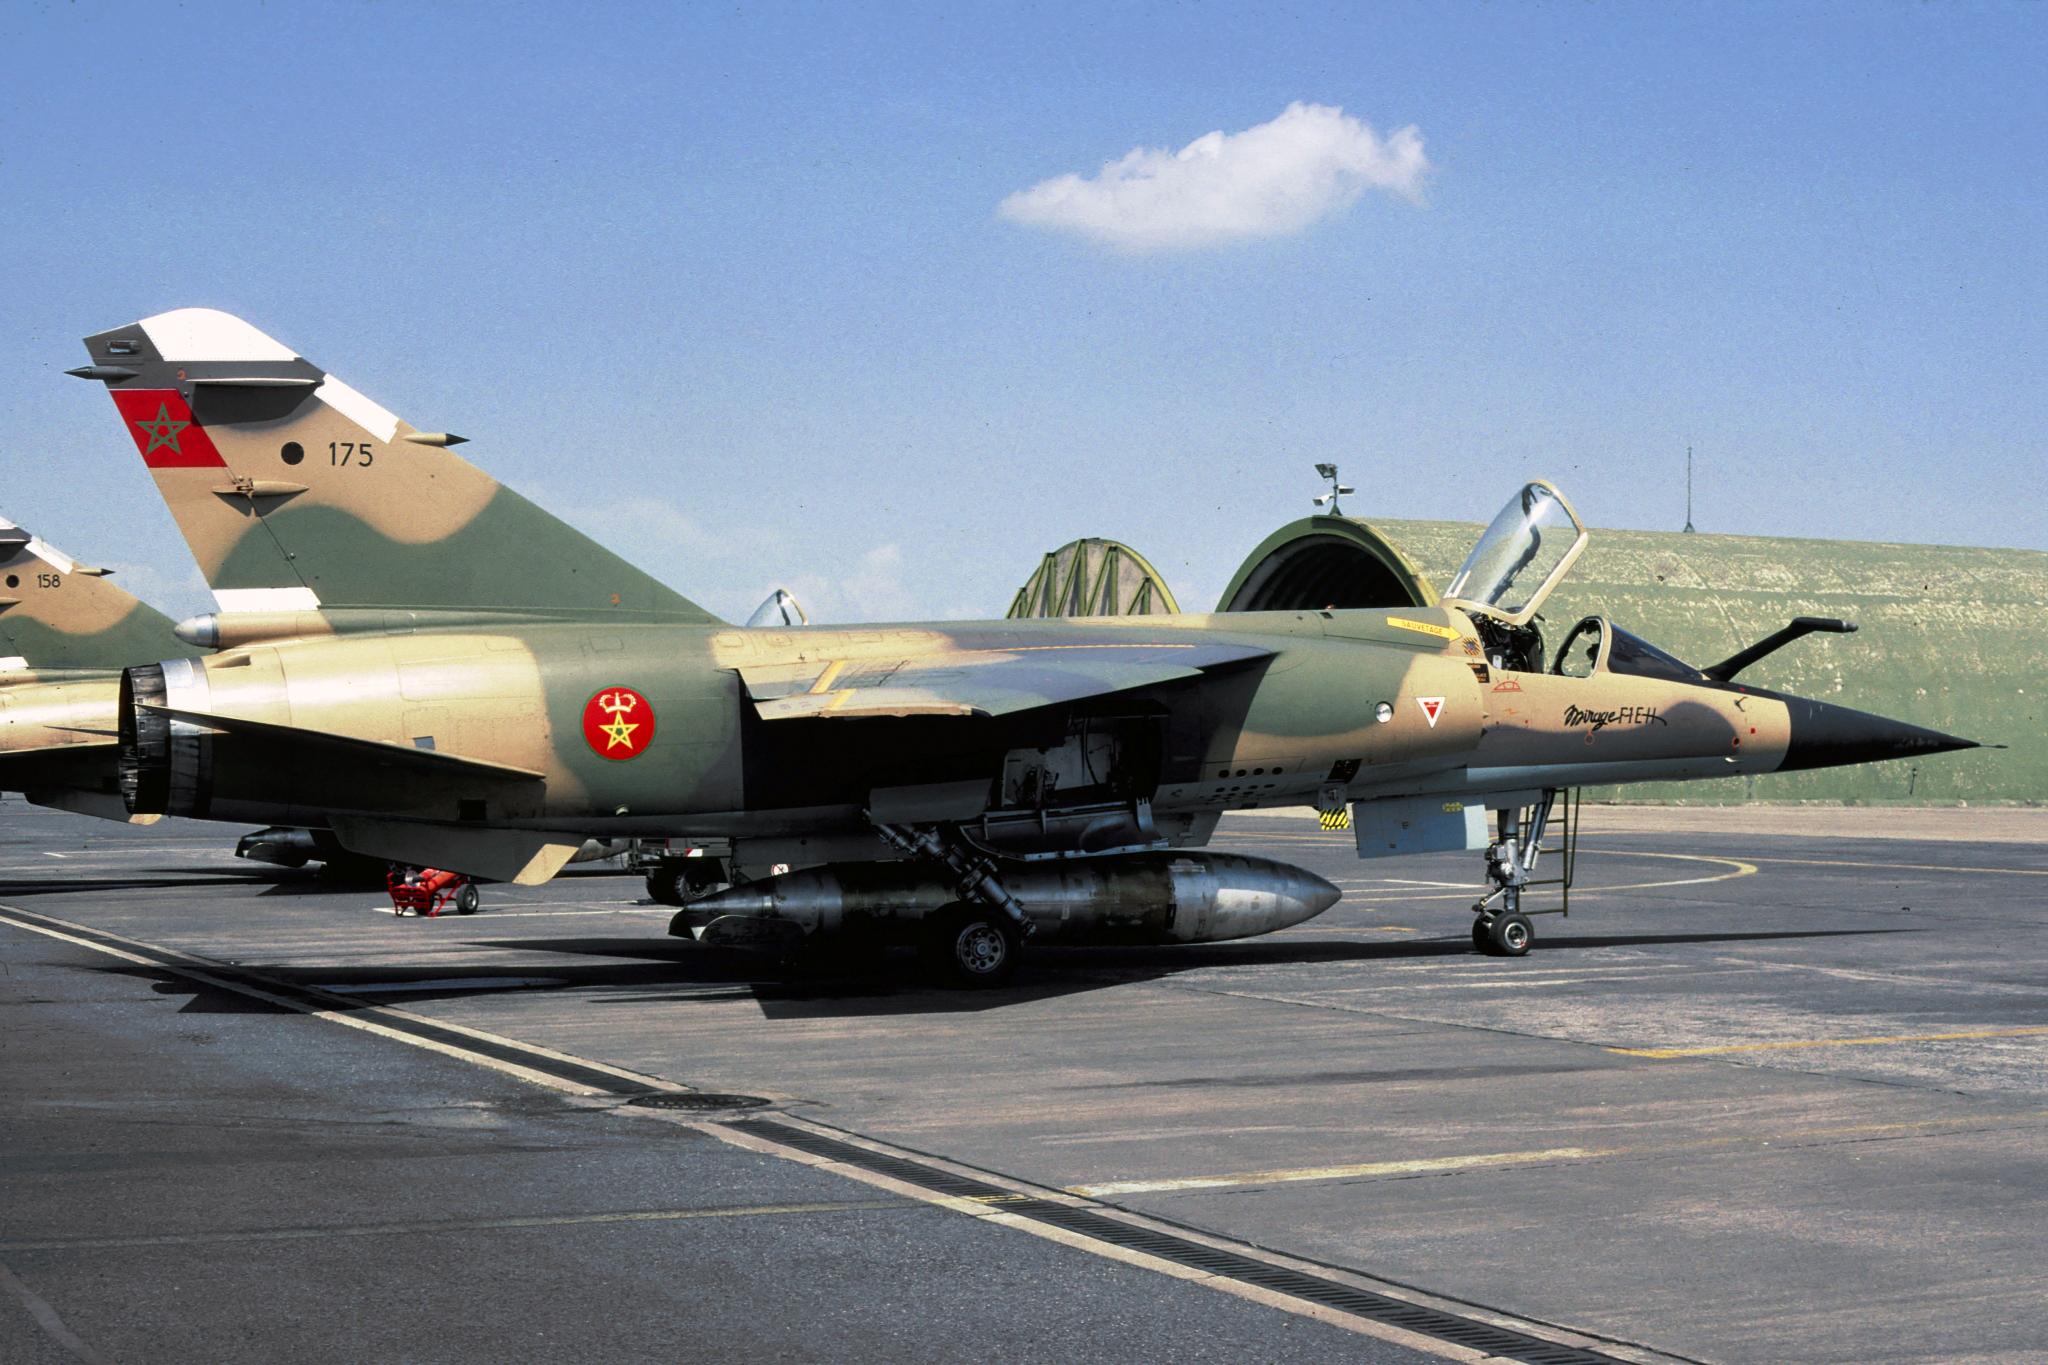 FRA: Photos Mirage F1 - Page 15 48900278303_ca3da35405_o